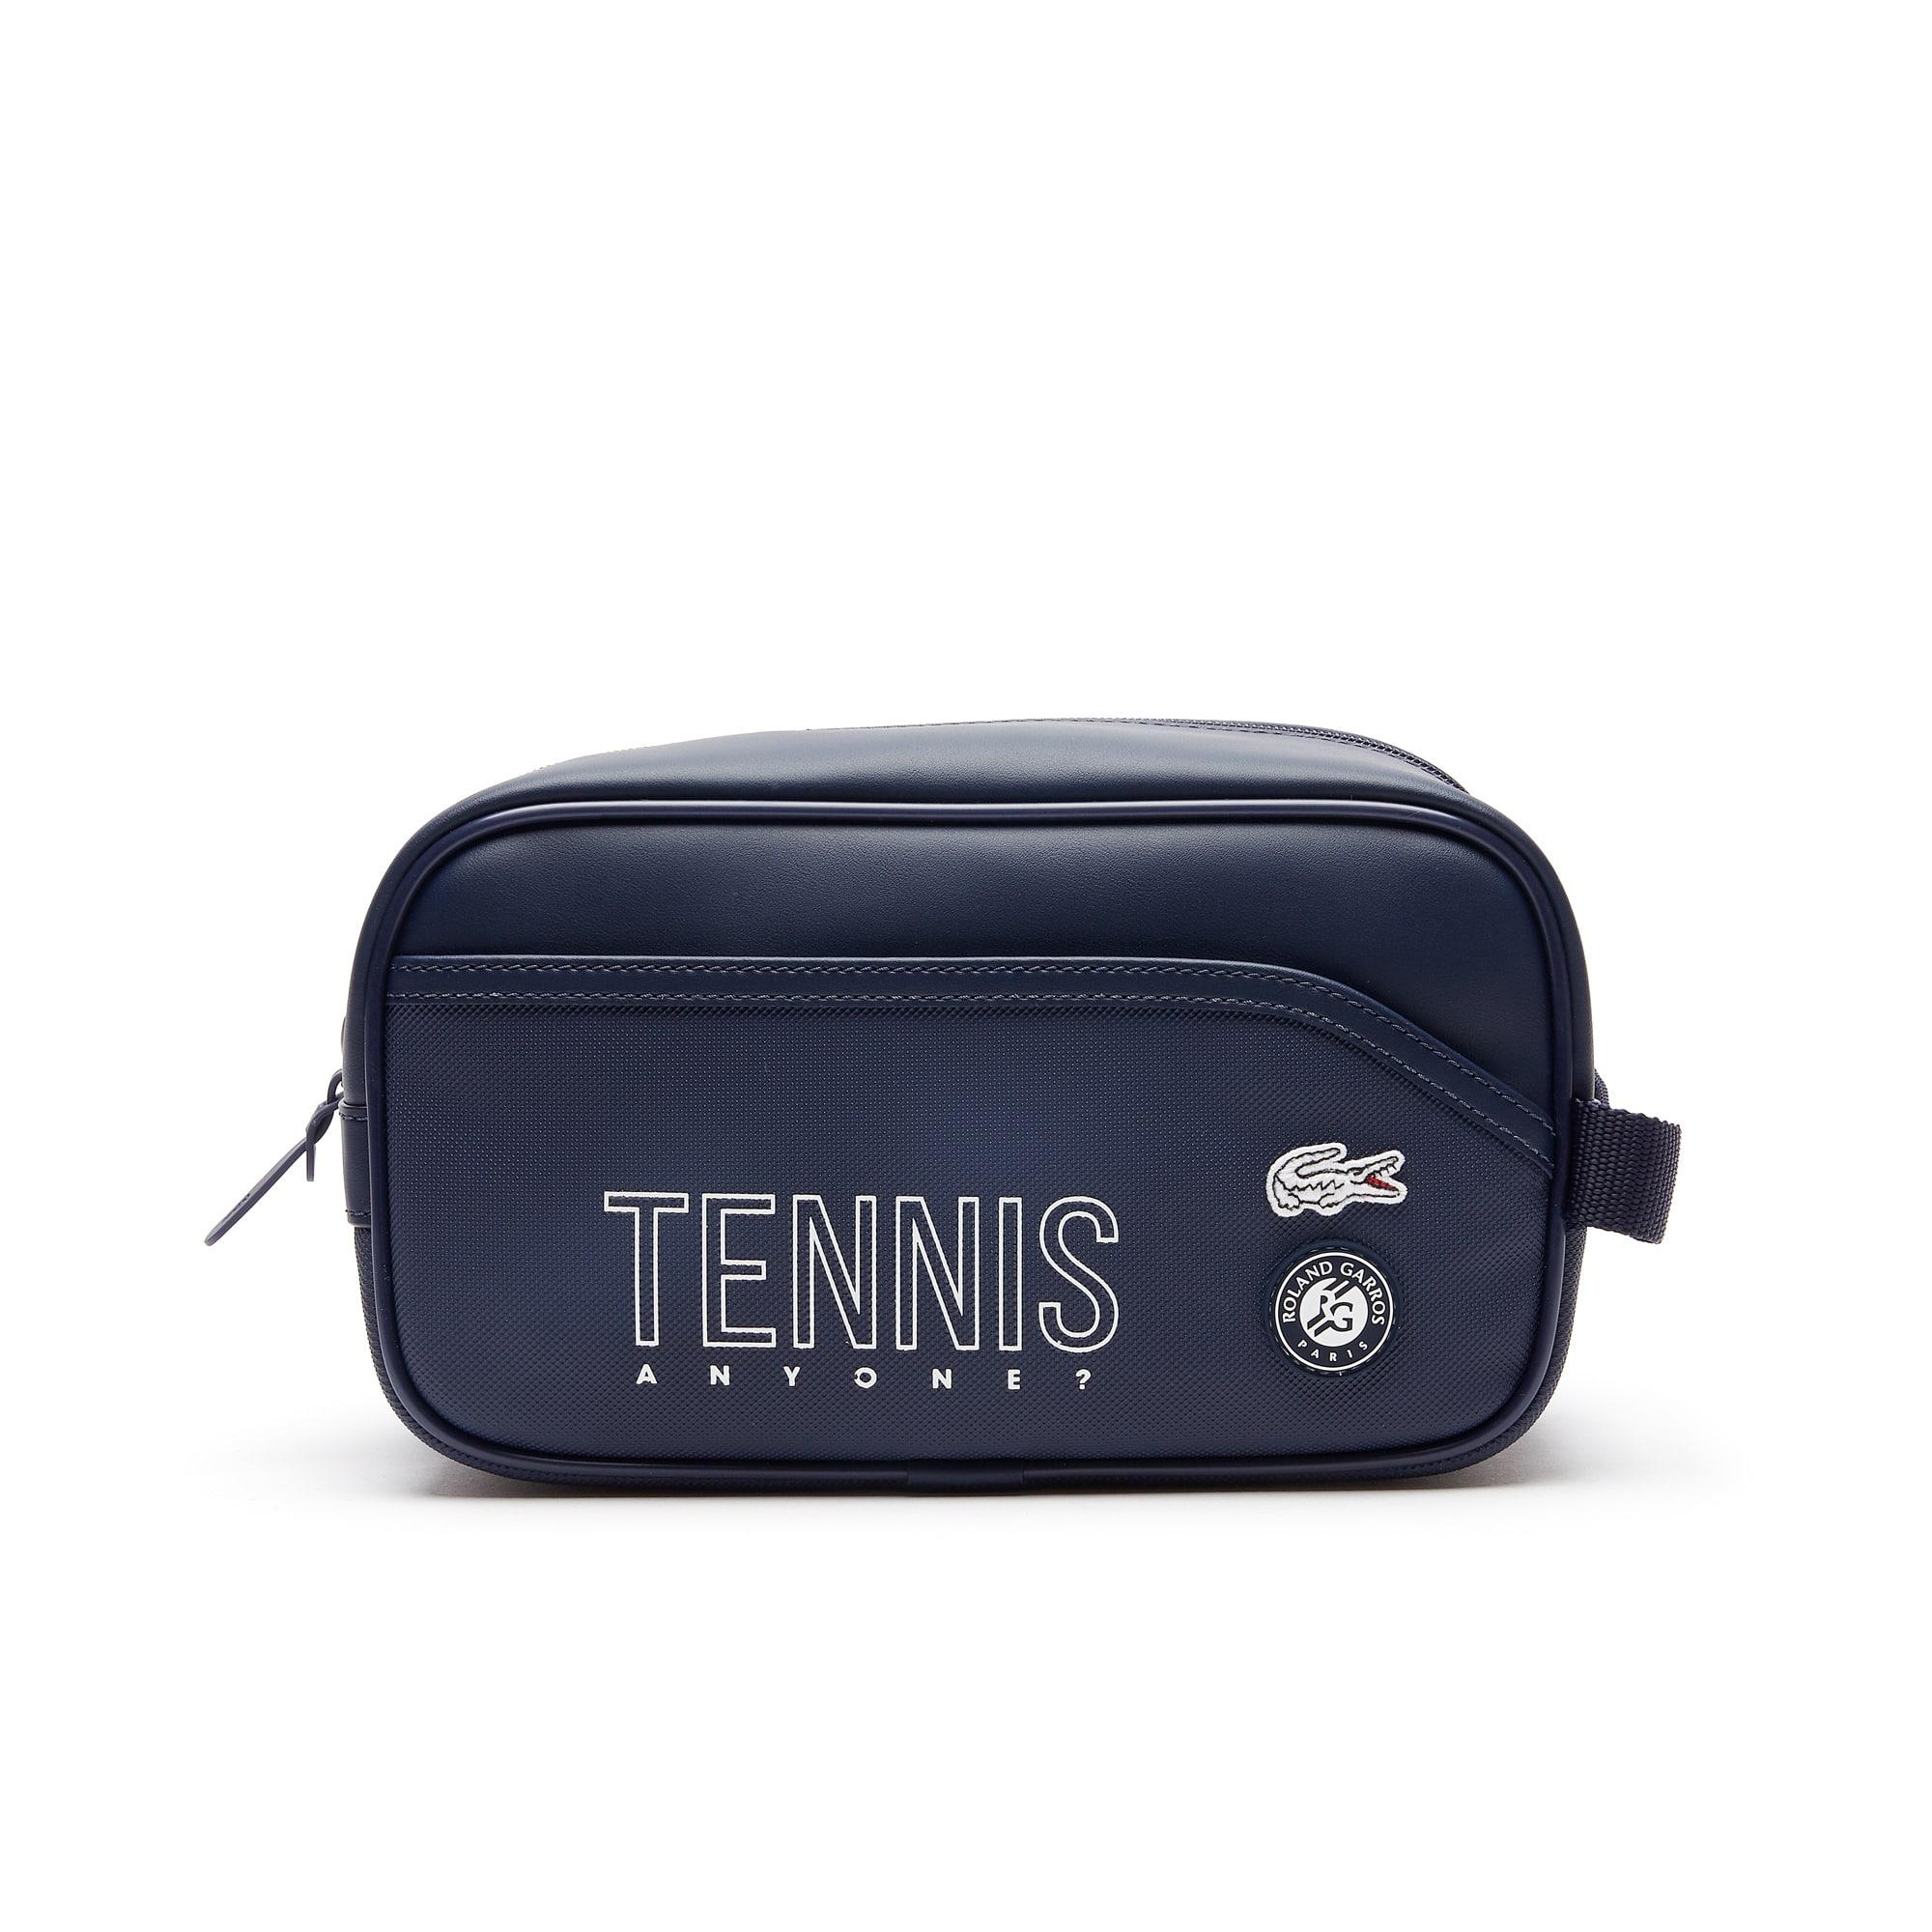 Men's Lacoste SPORT Roland Garros Lettering Toilet Kit